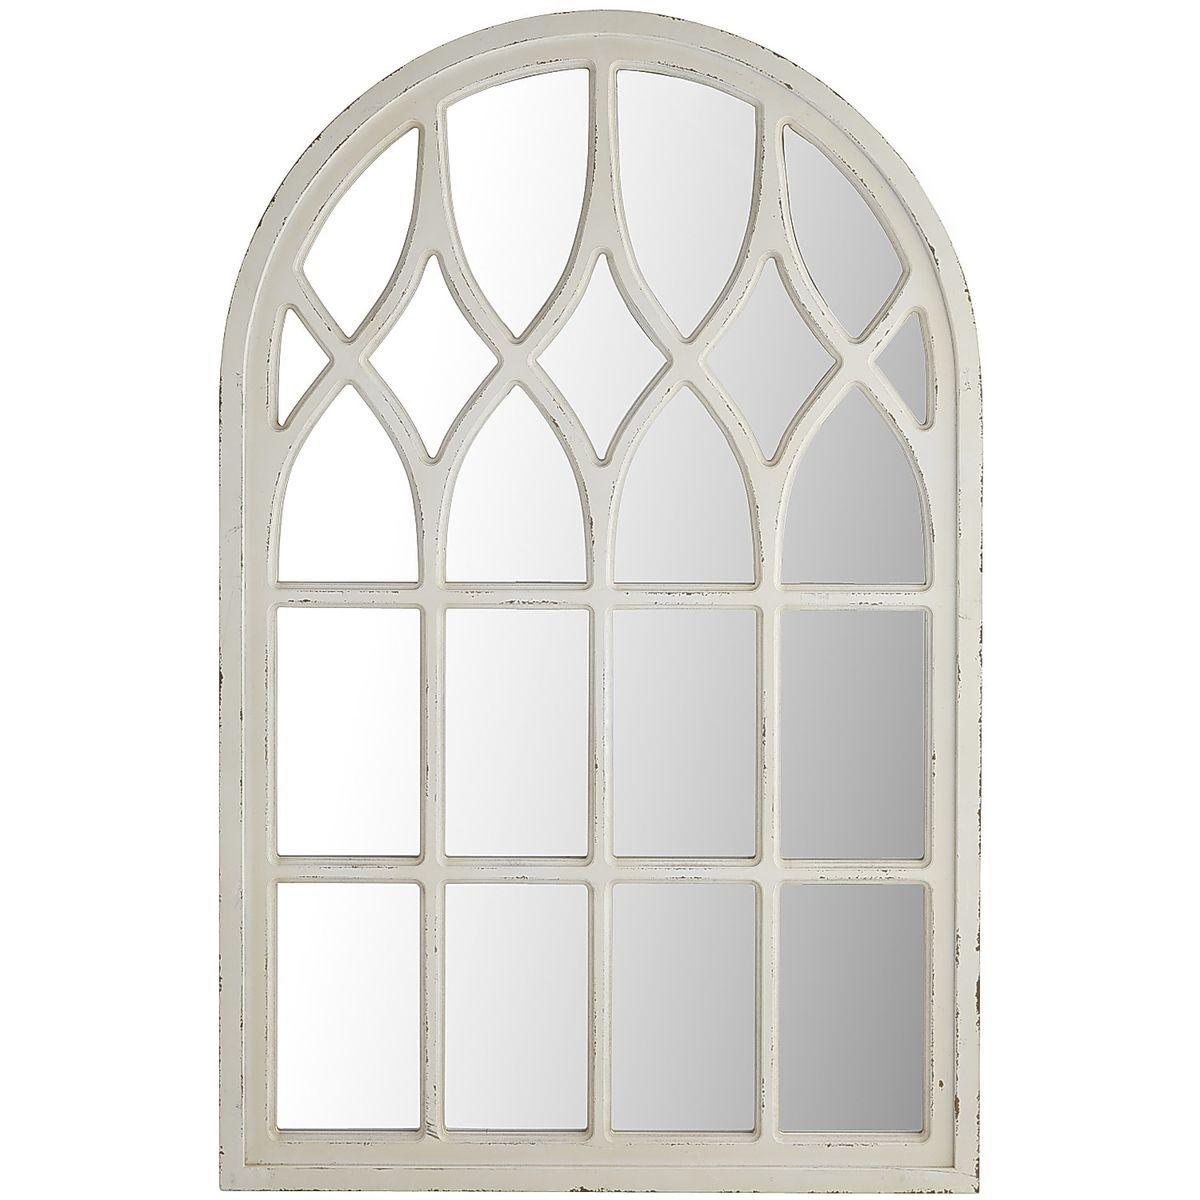 Whitewashed Arch Window Mirror Arched Window Mirror Window Mirror White Windows